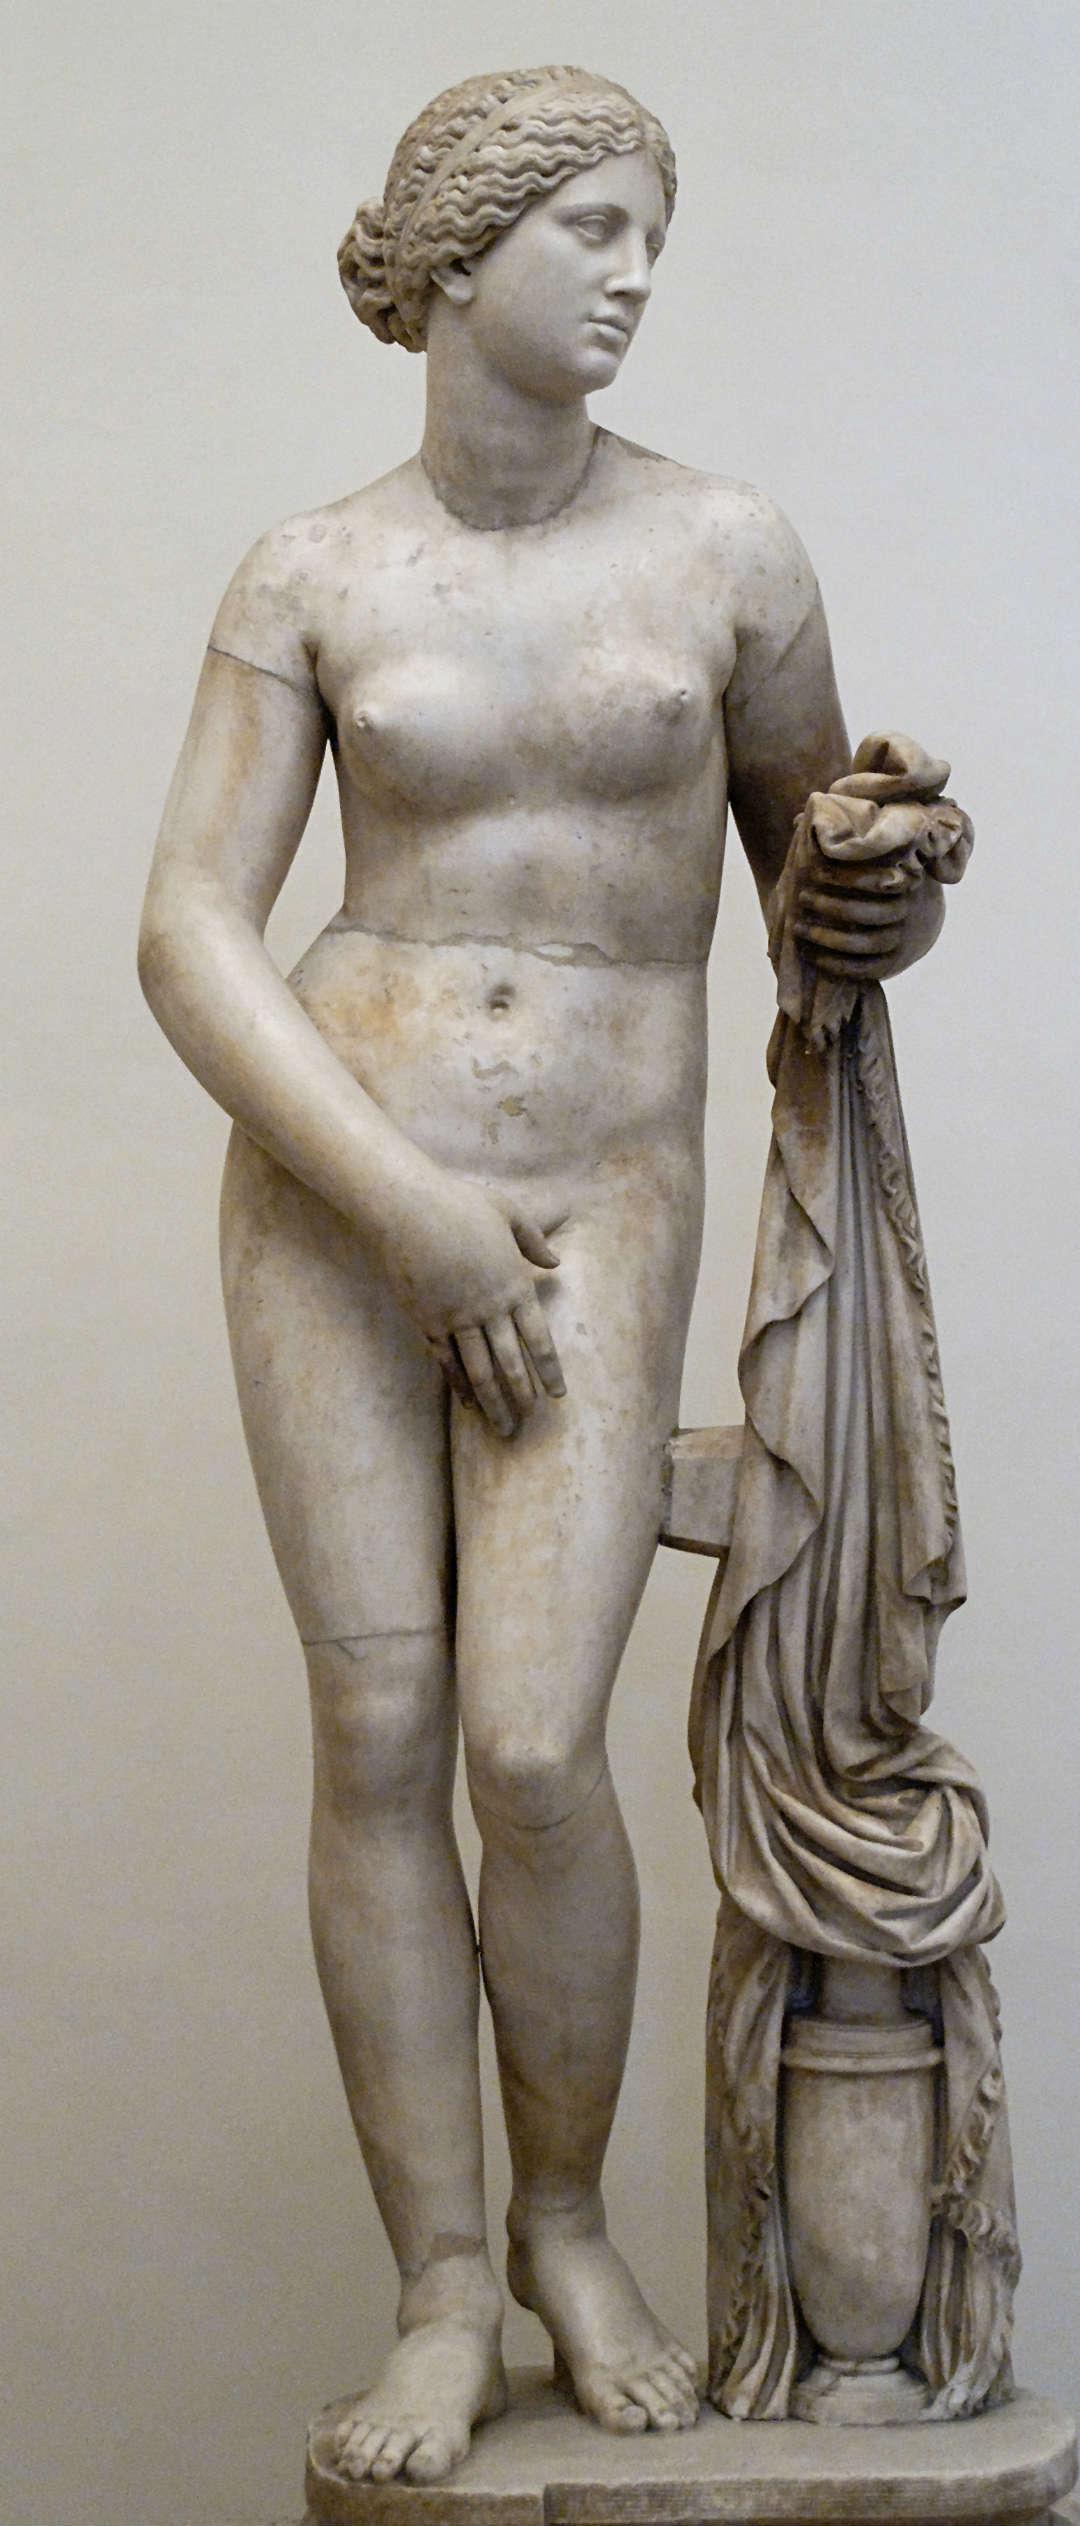 "La copia de Afrodita Cnidia llamada de ""Altemps"" o Ludovisi"